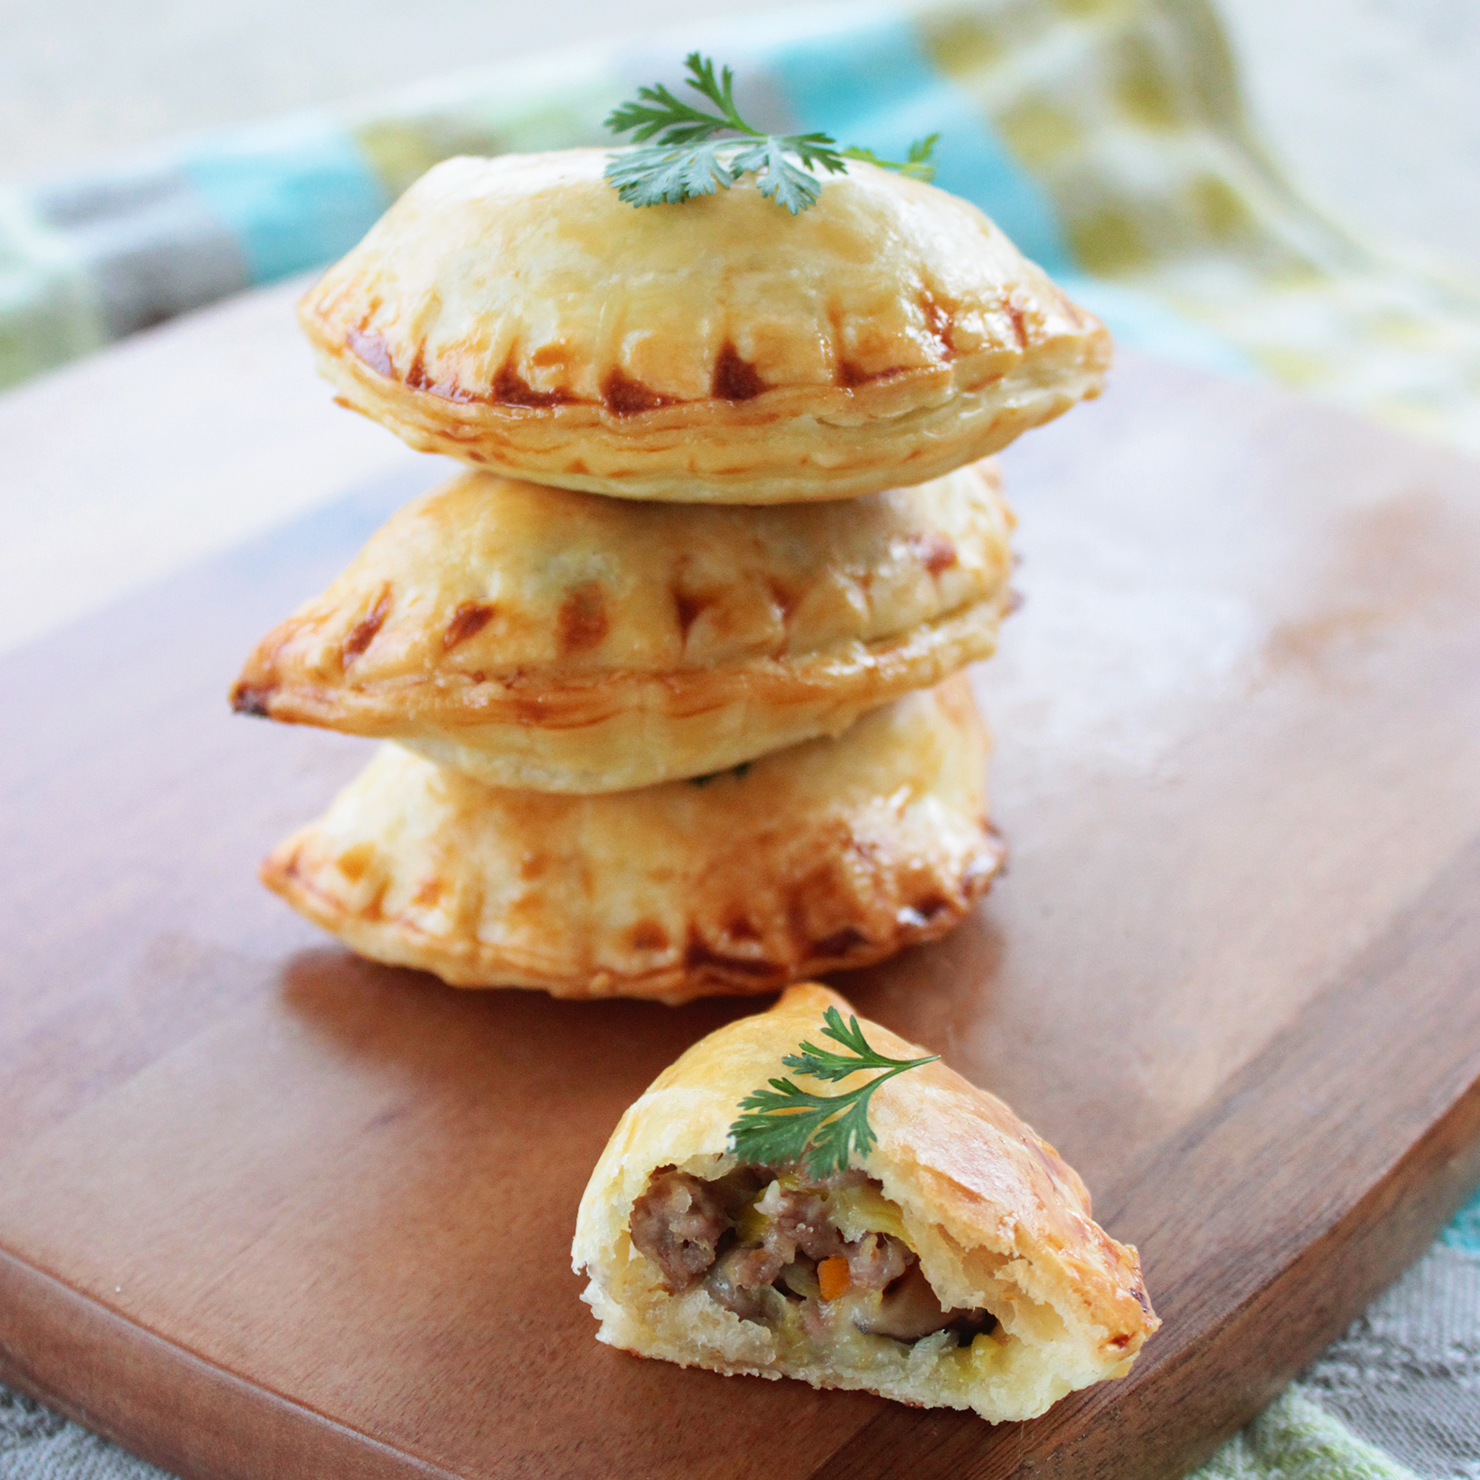 celine bags online shopping - Empanadas with Lamb and Mushroom Recipe | TasteSpotting